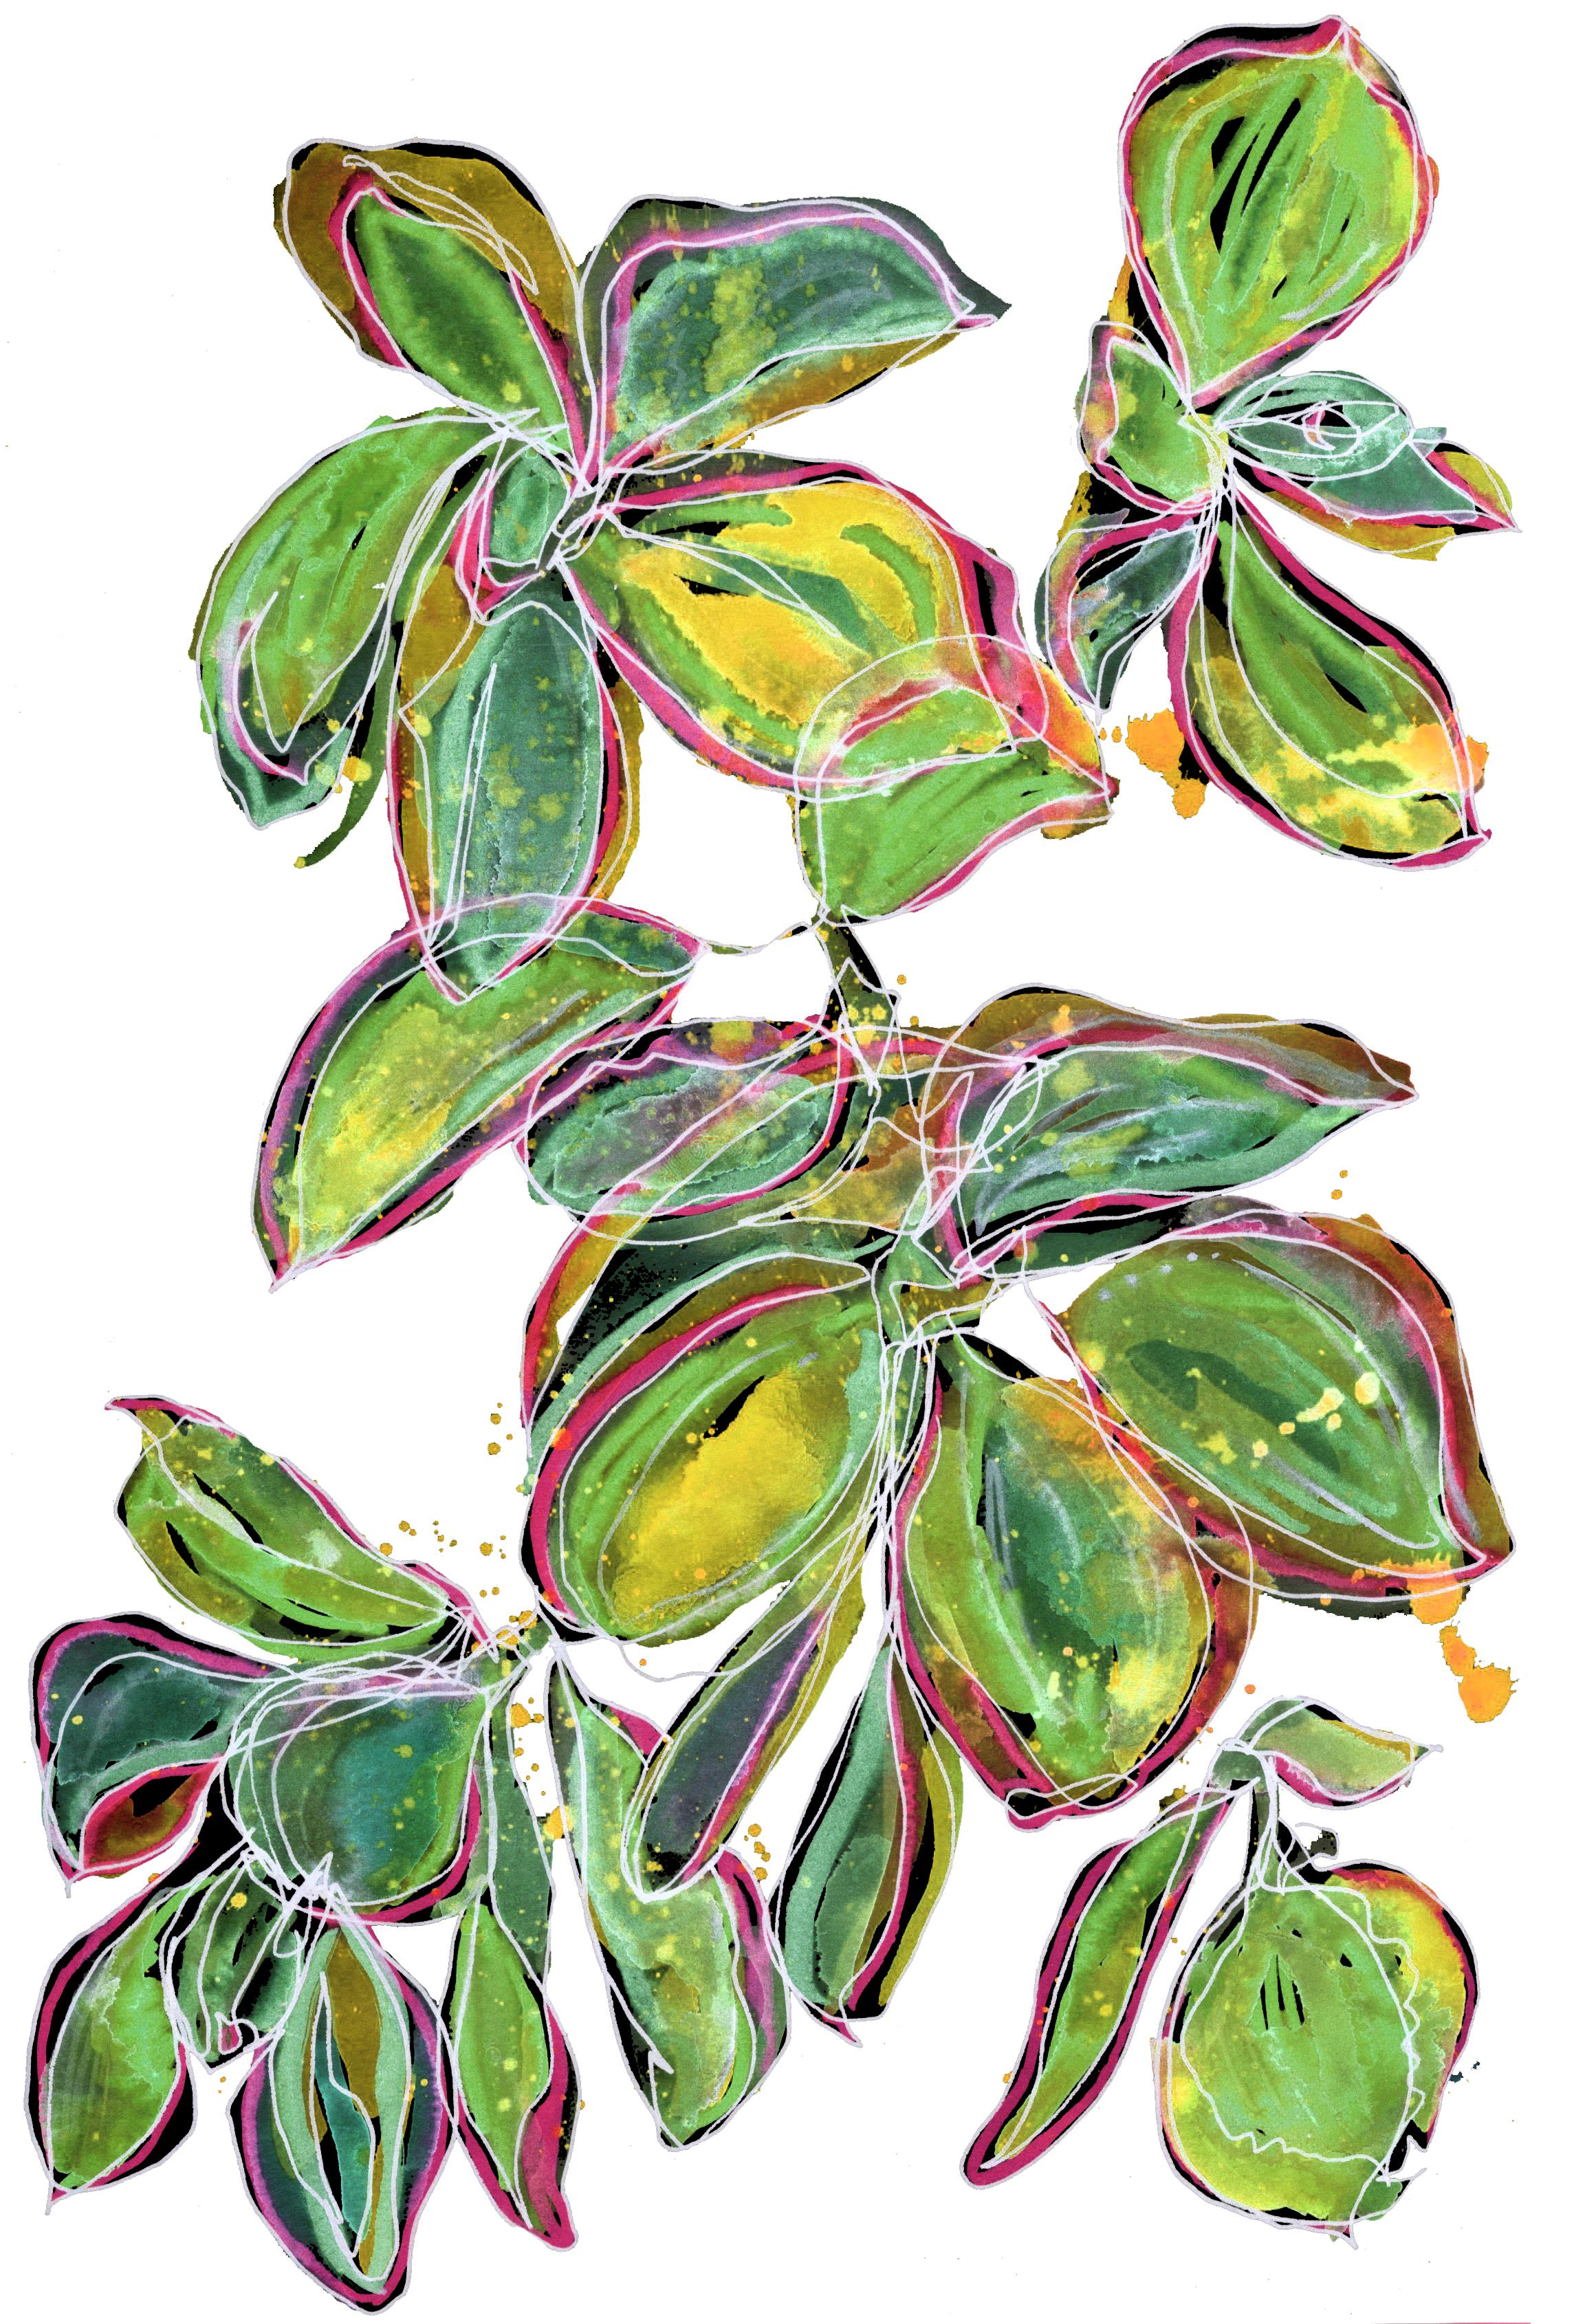 Cacti Leaves Study